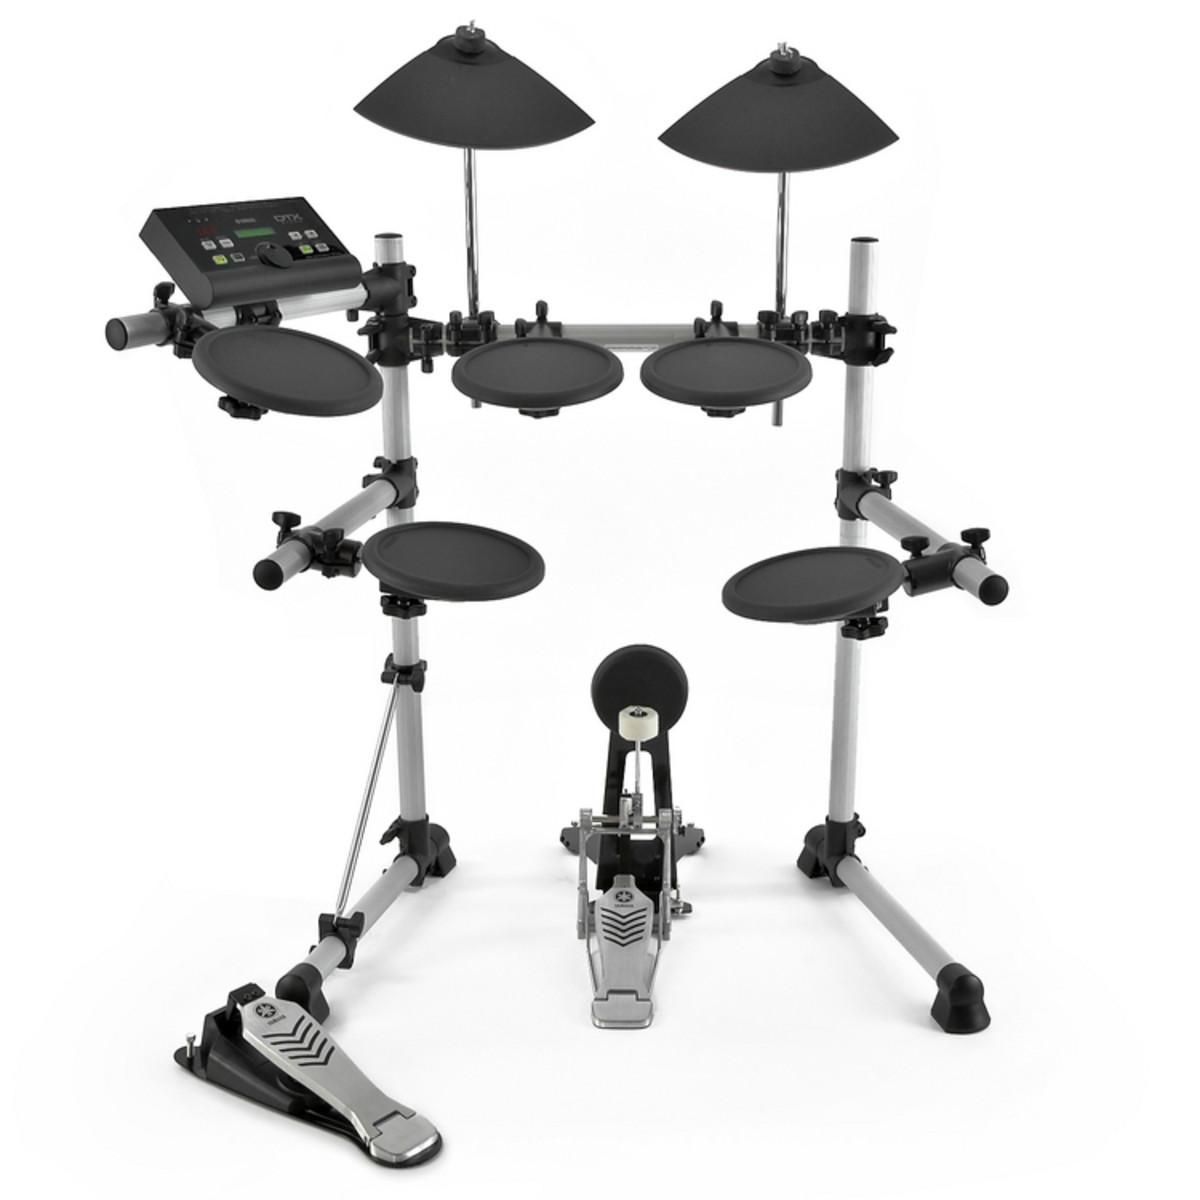 Disc yamaha batterie lectronique dtx500k for Yamaha yxz gear reduction kit